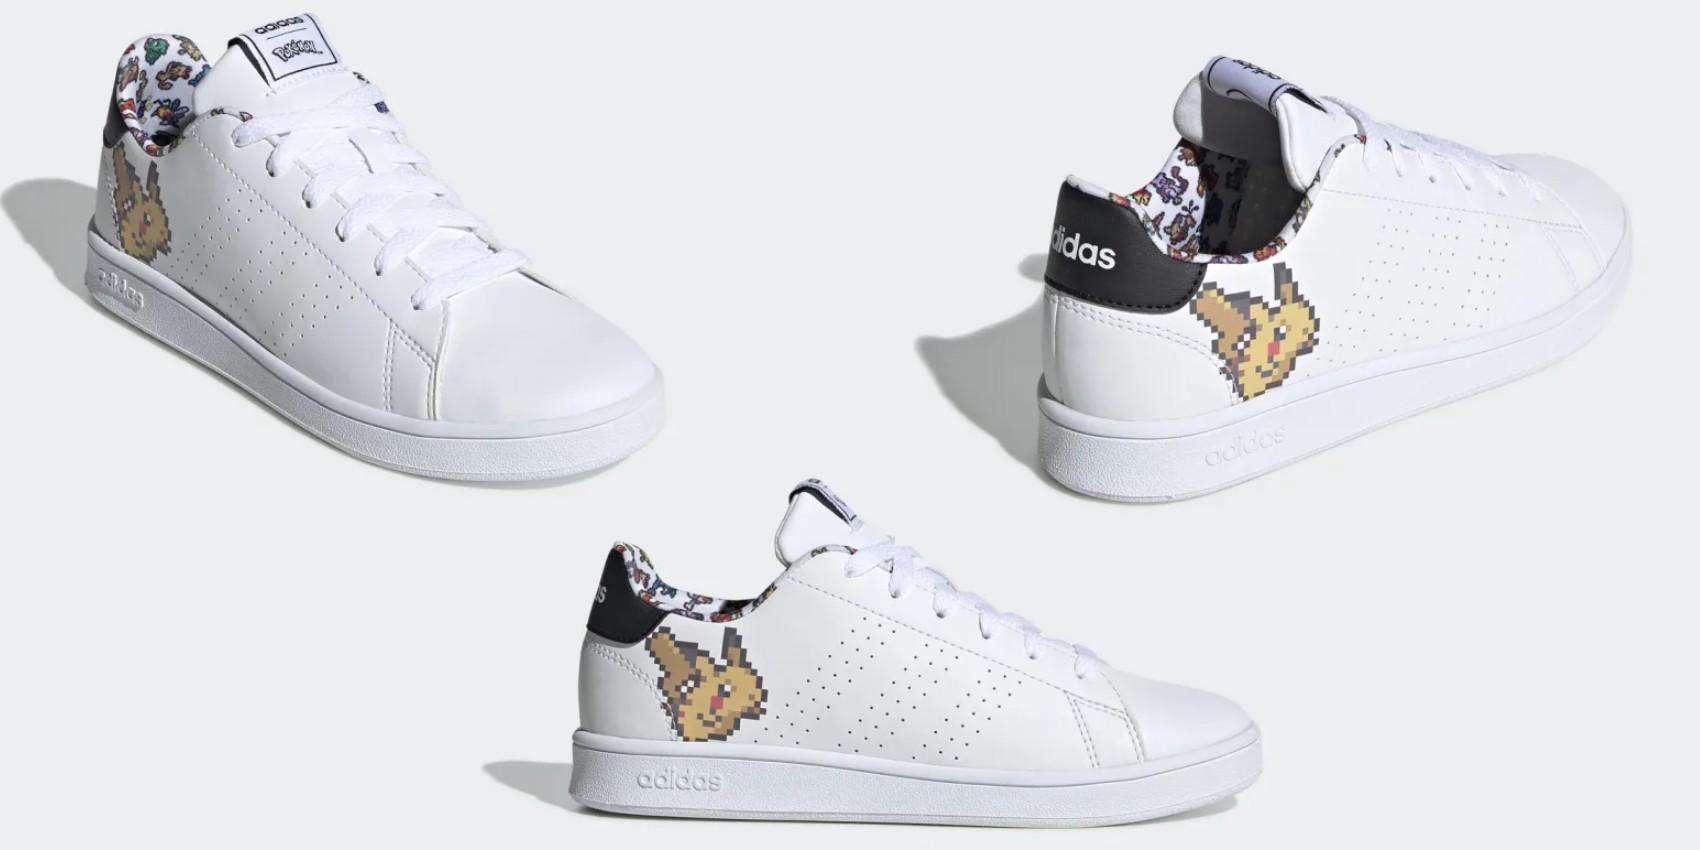 New adidas Pokémon shoes are definetly